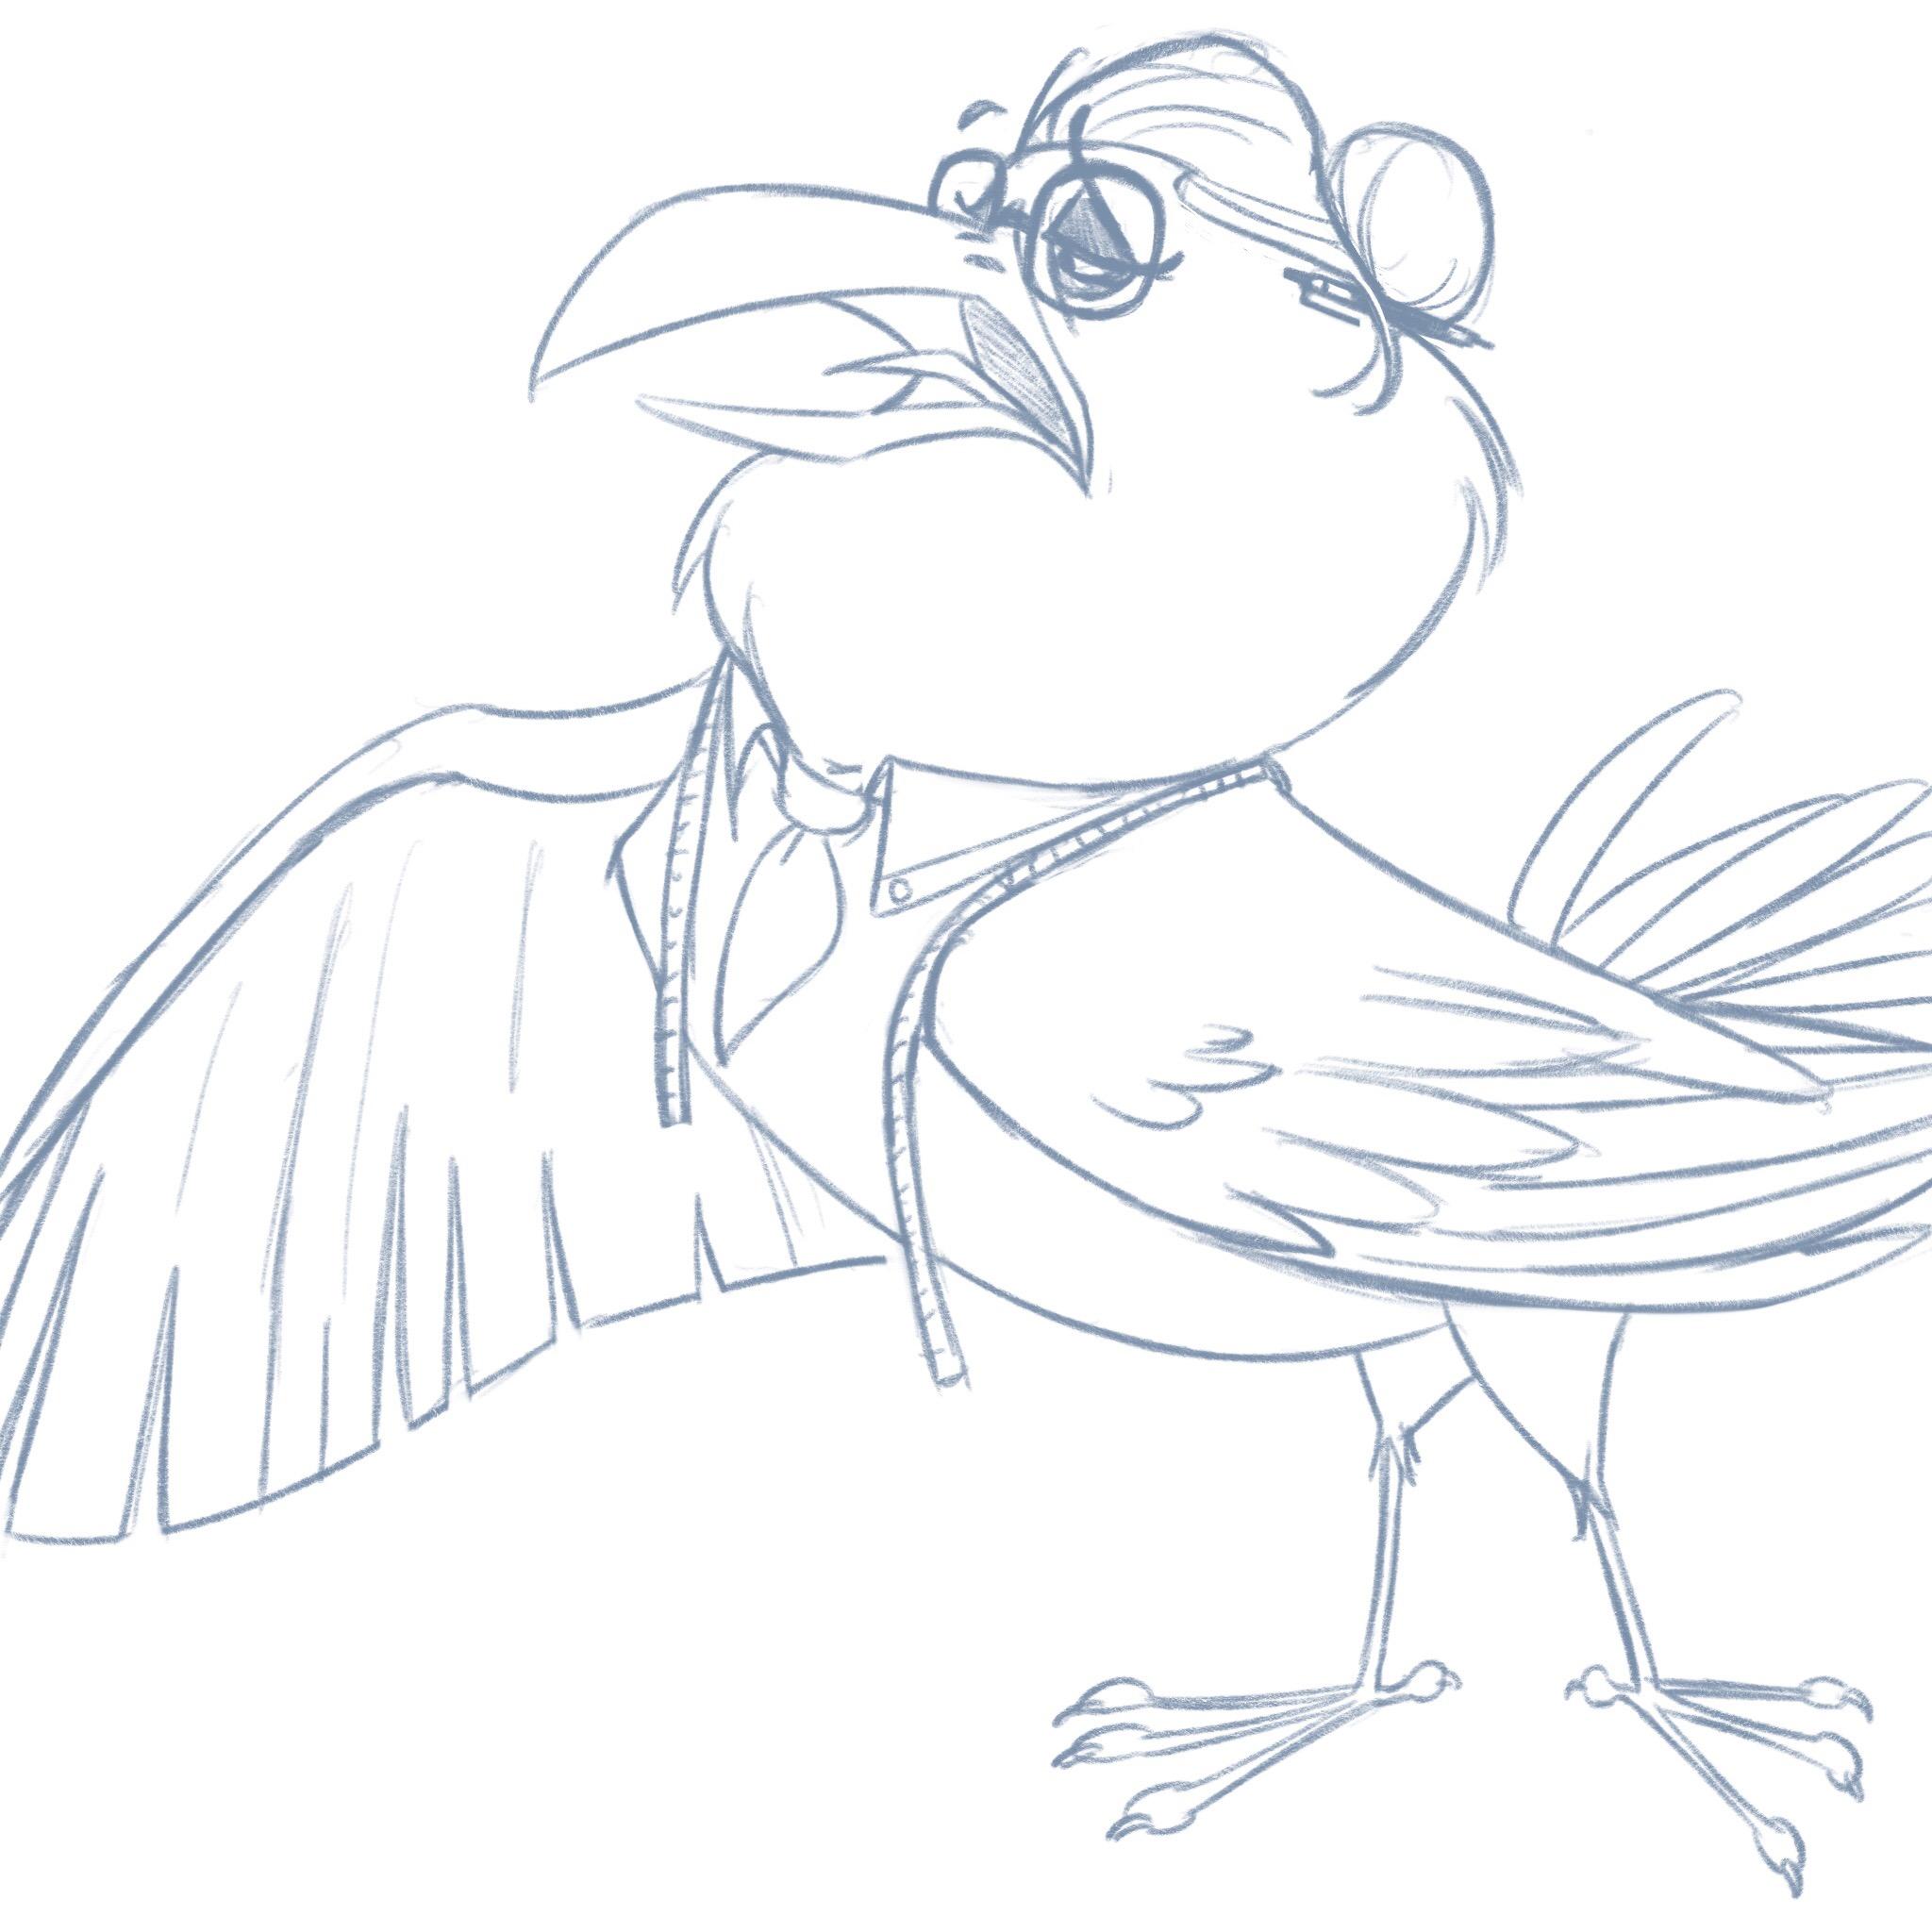 Raven fashion designer